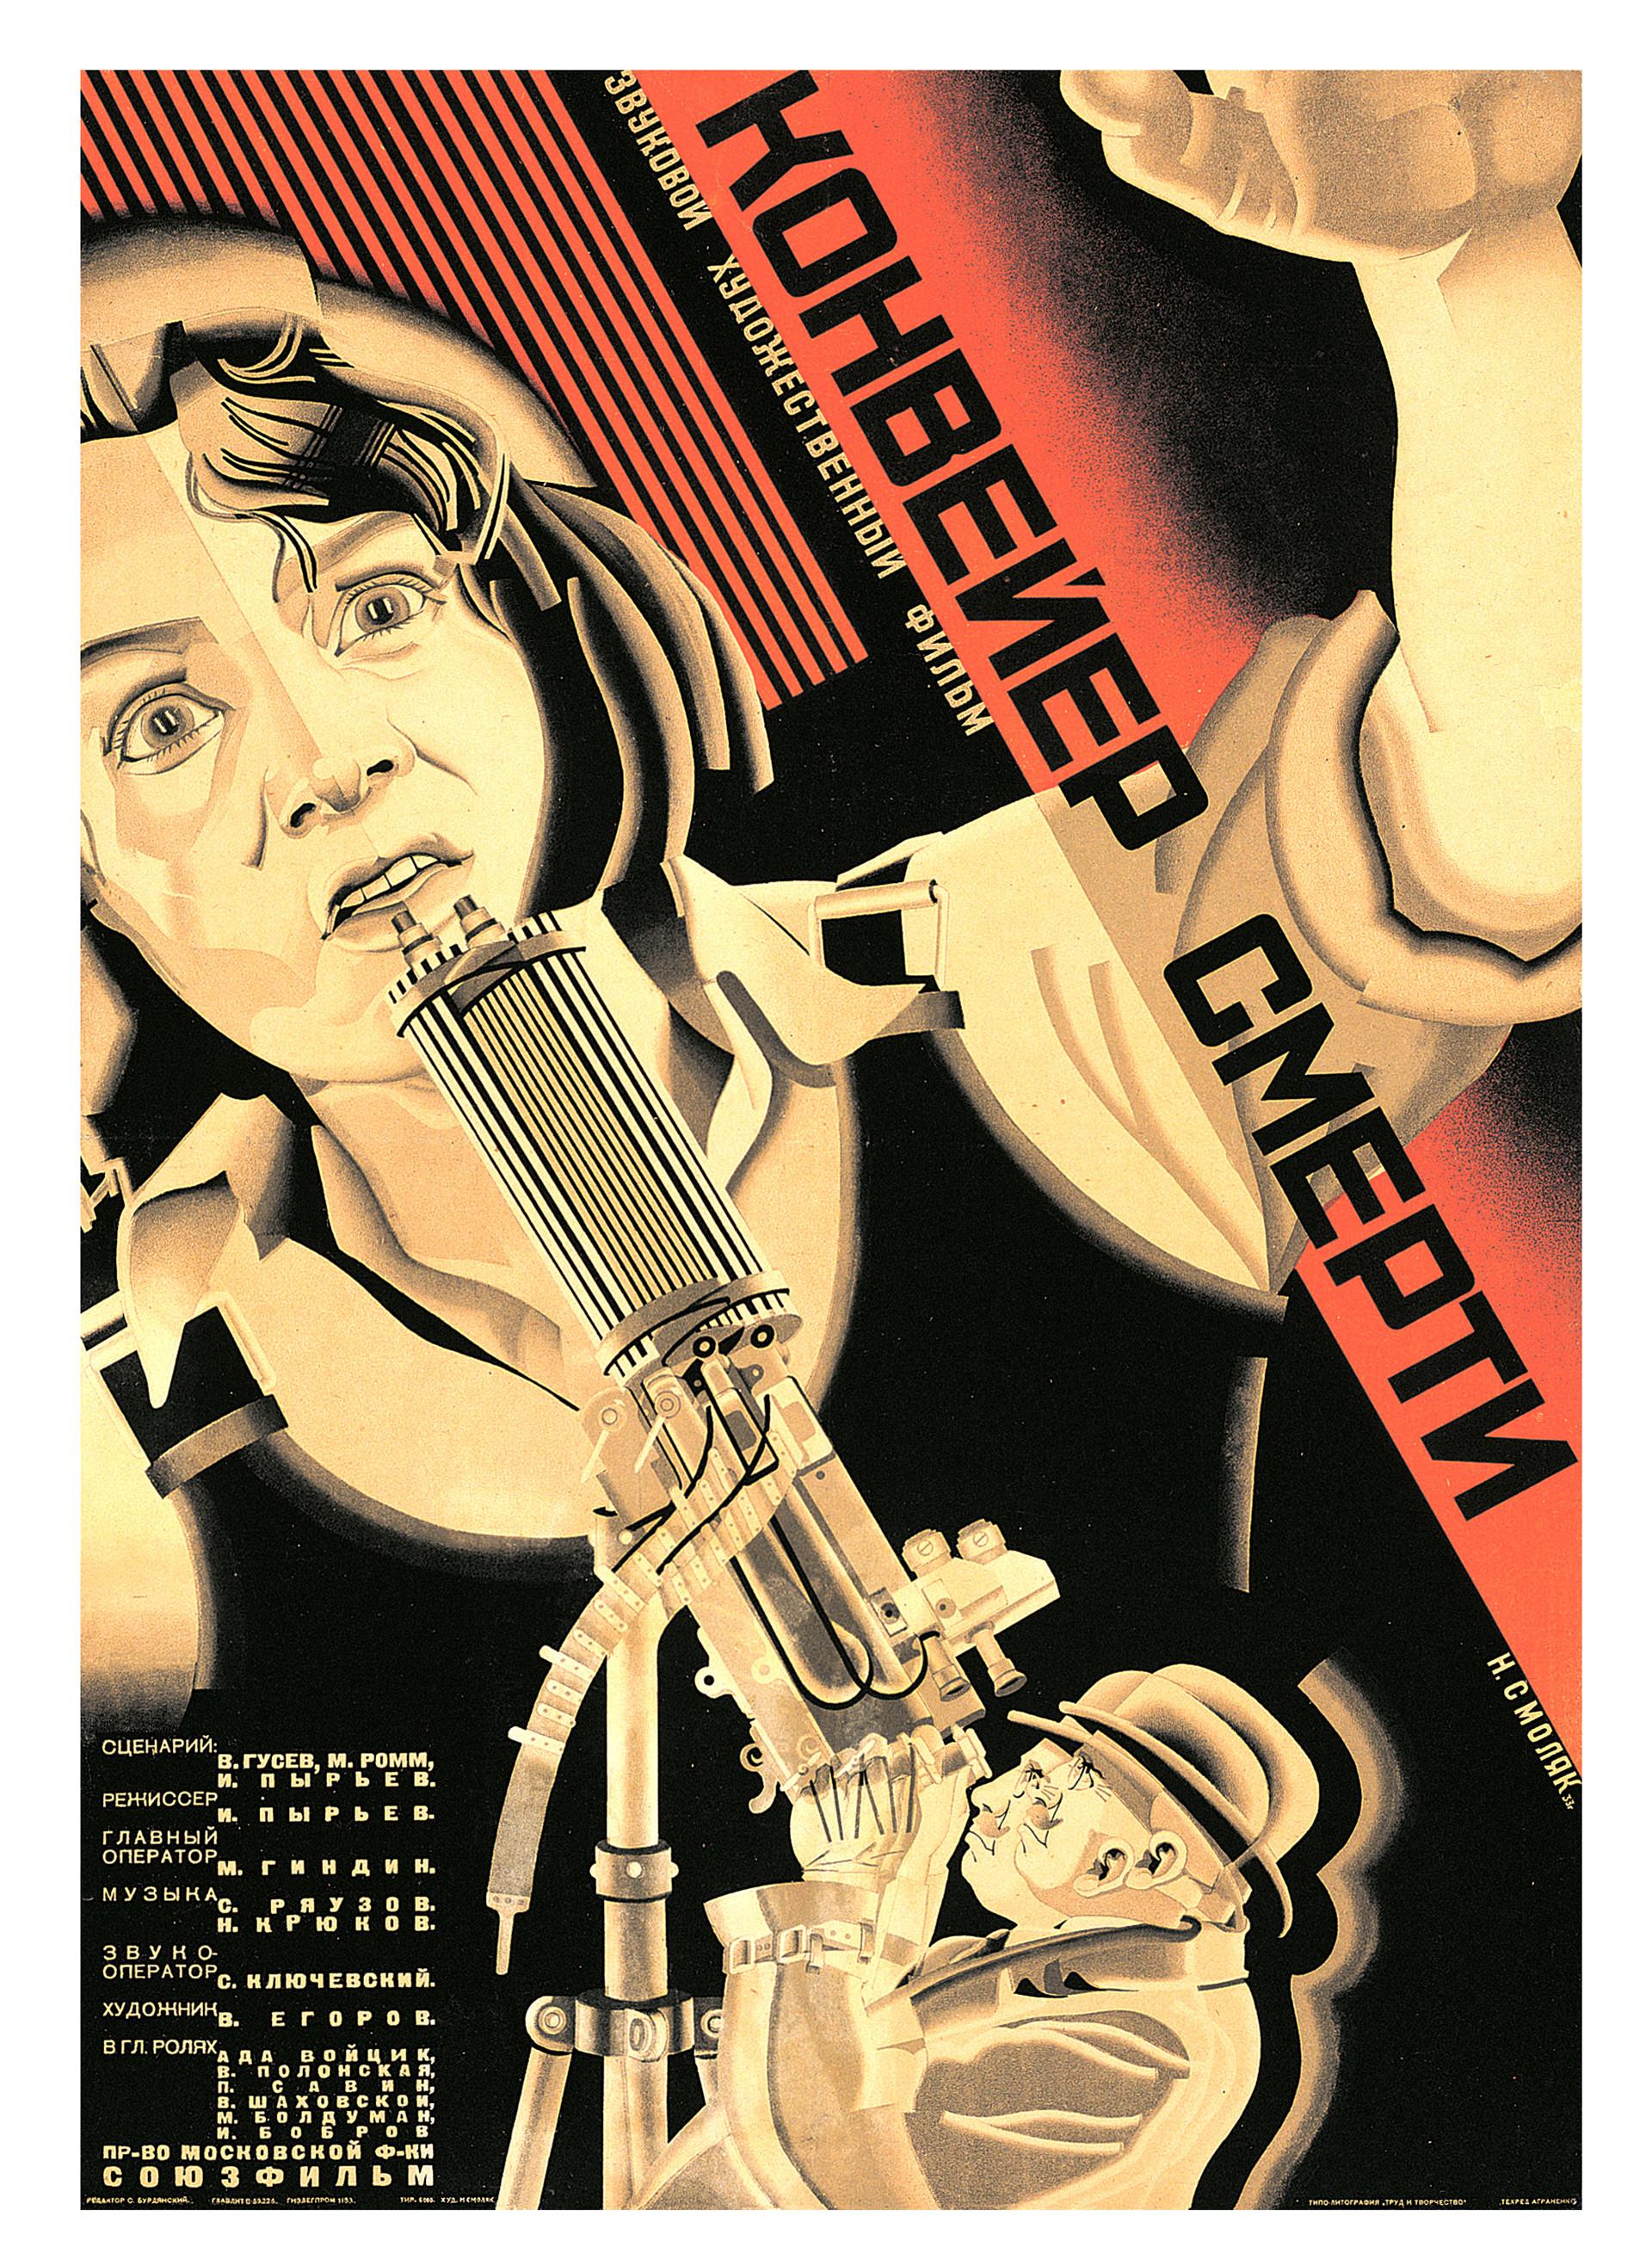 """Транспортер смрти"" (1933), Смољаковски"